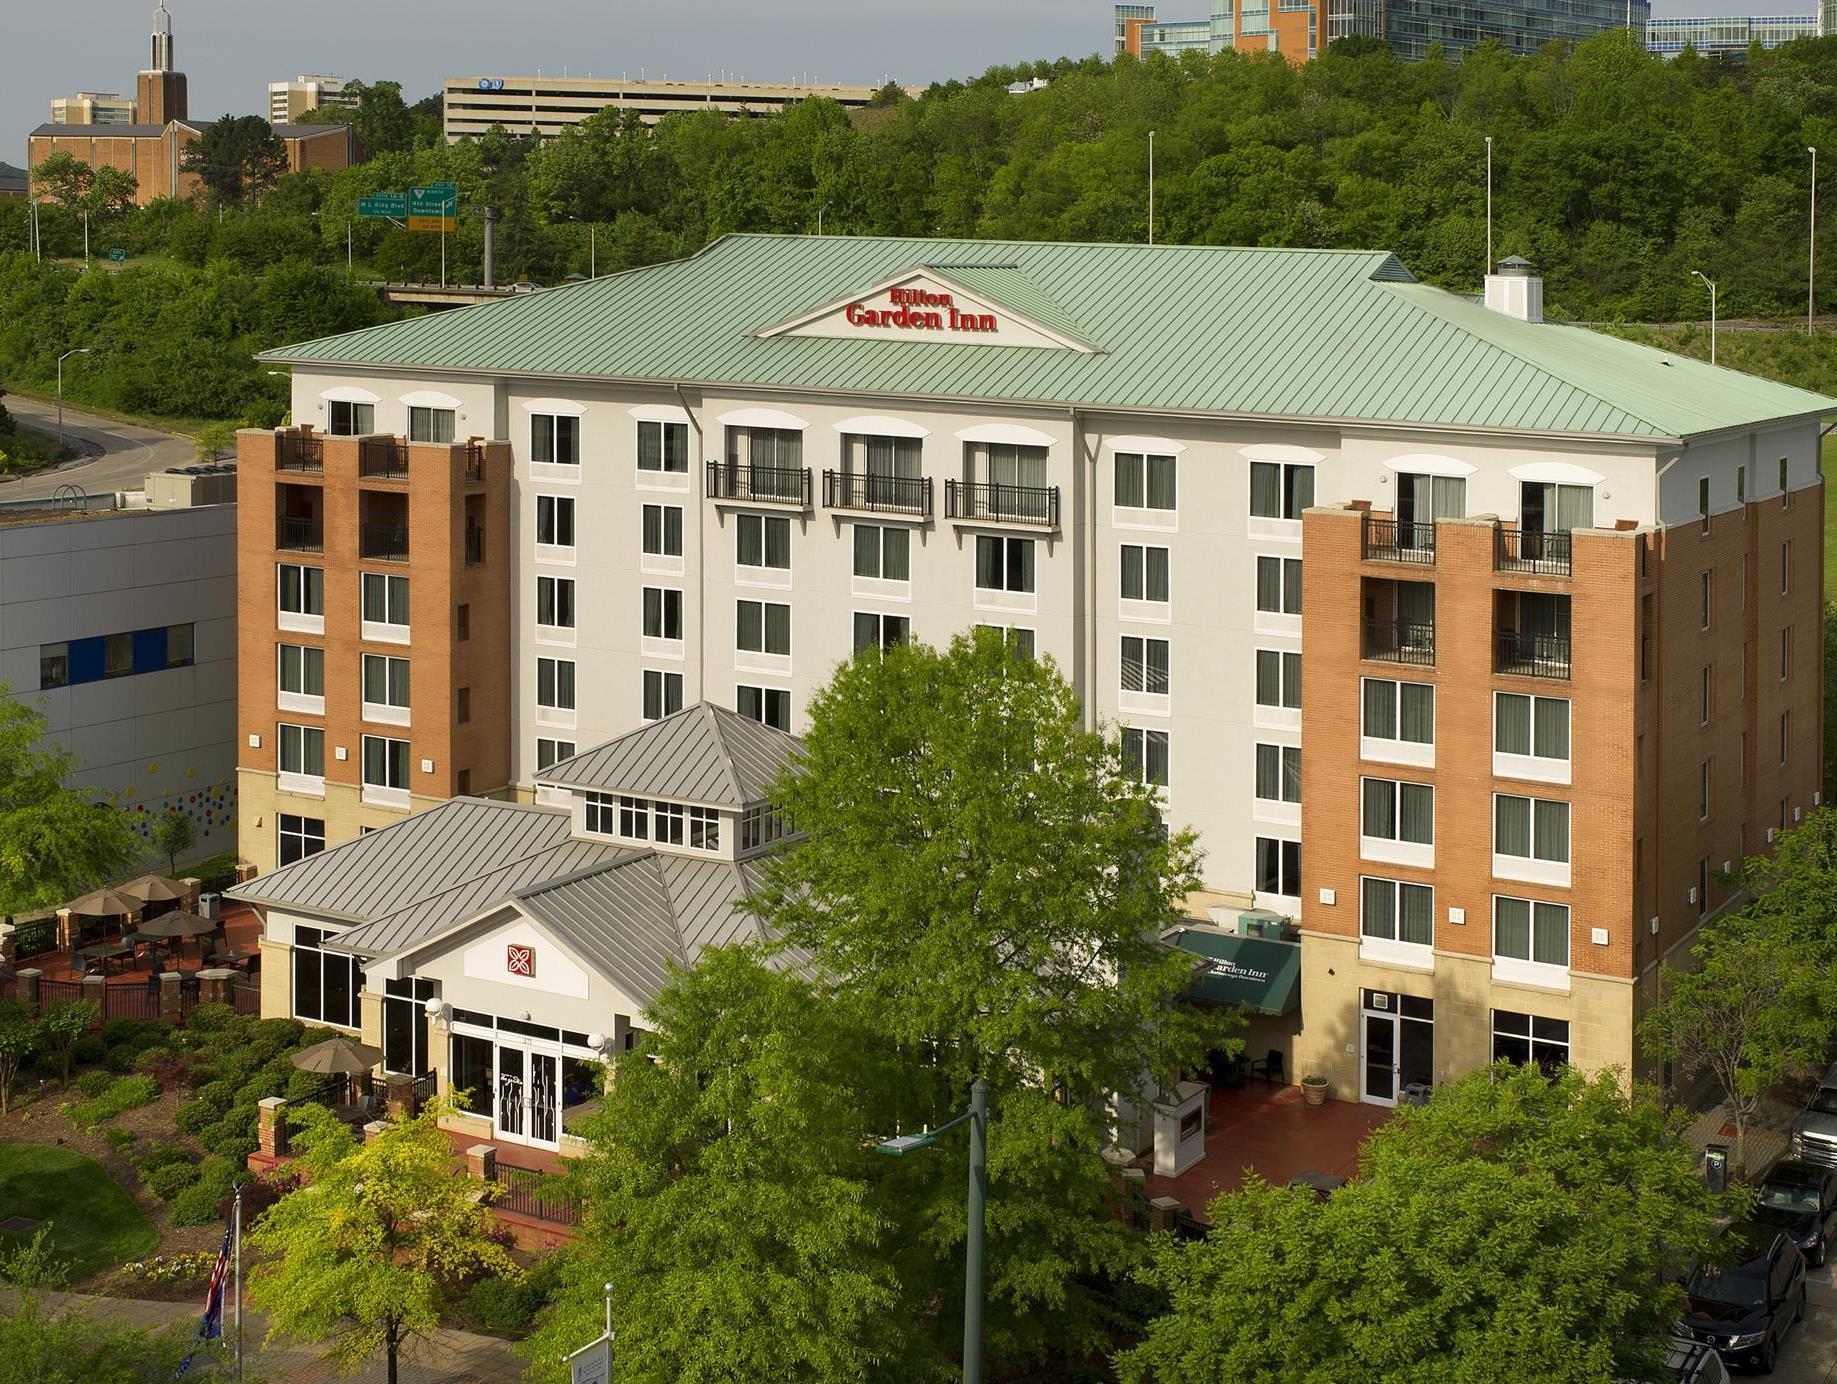 Hilton Garden Inn Chattanooga Downtown Hotel